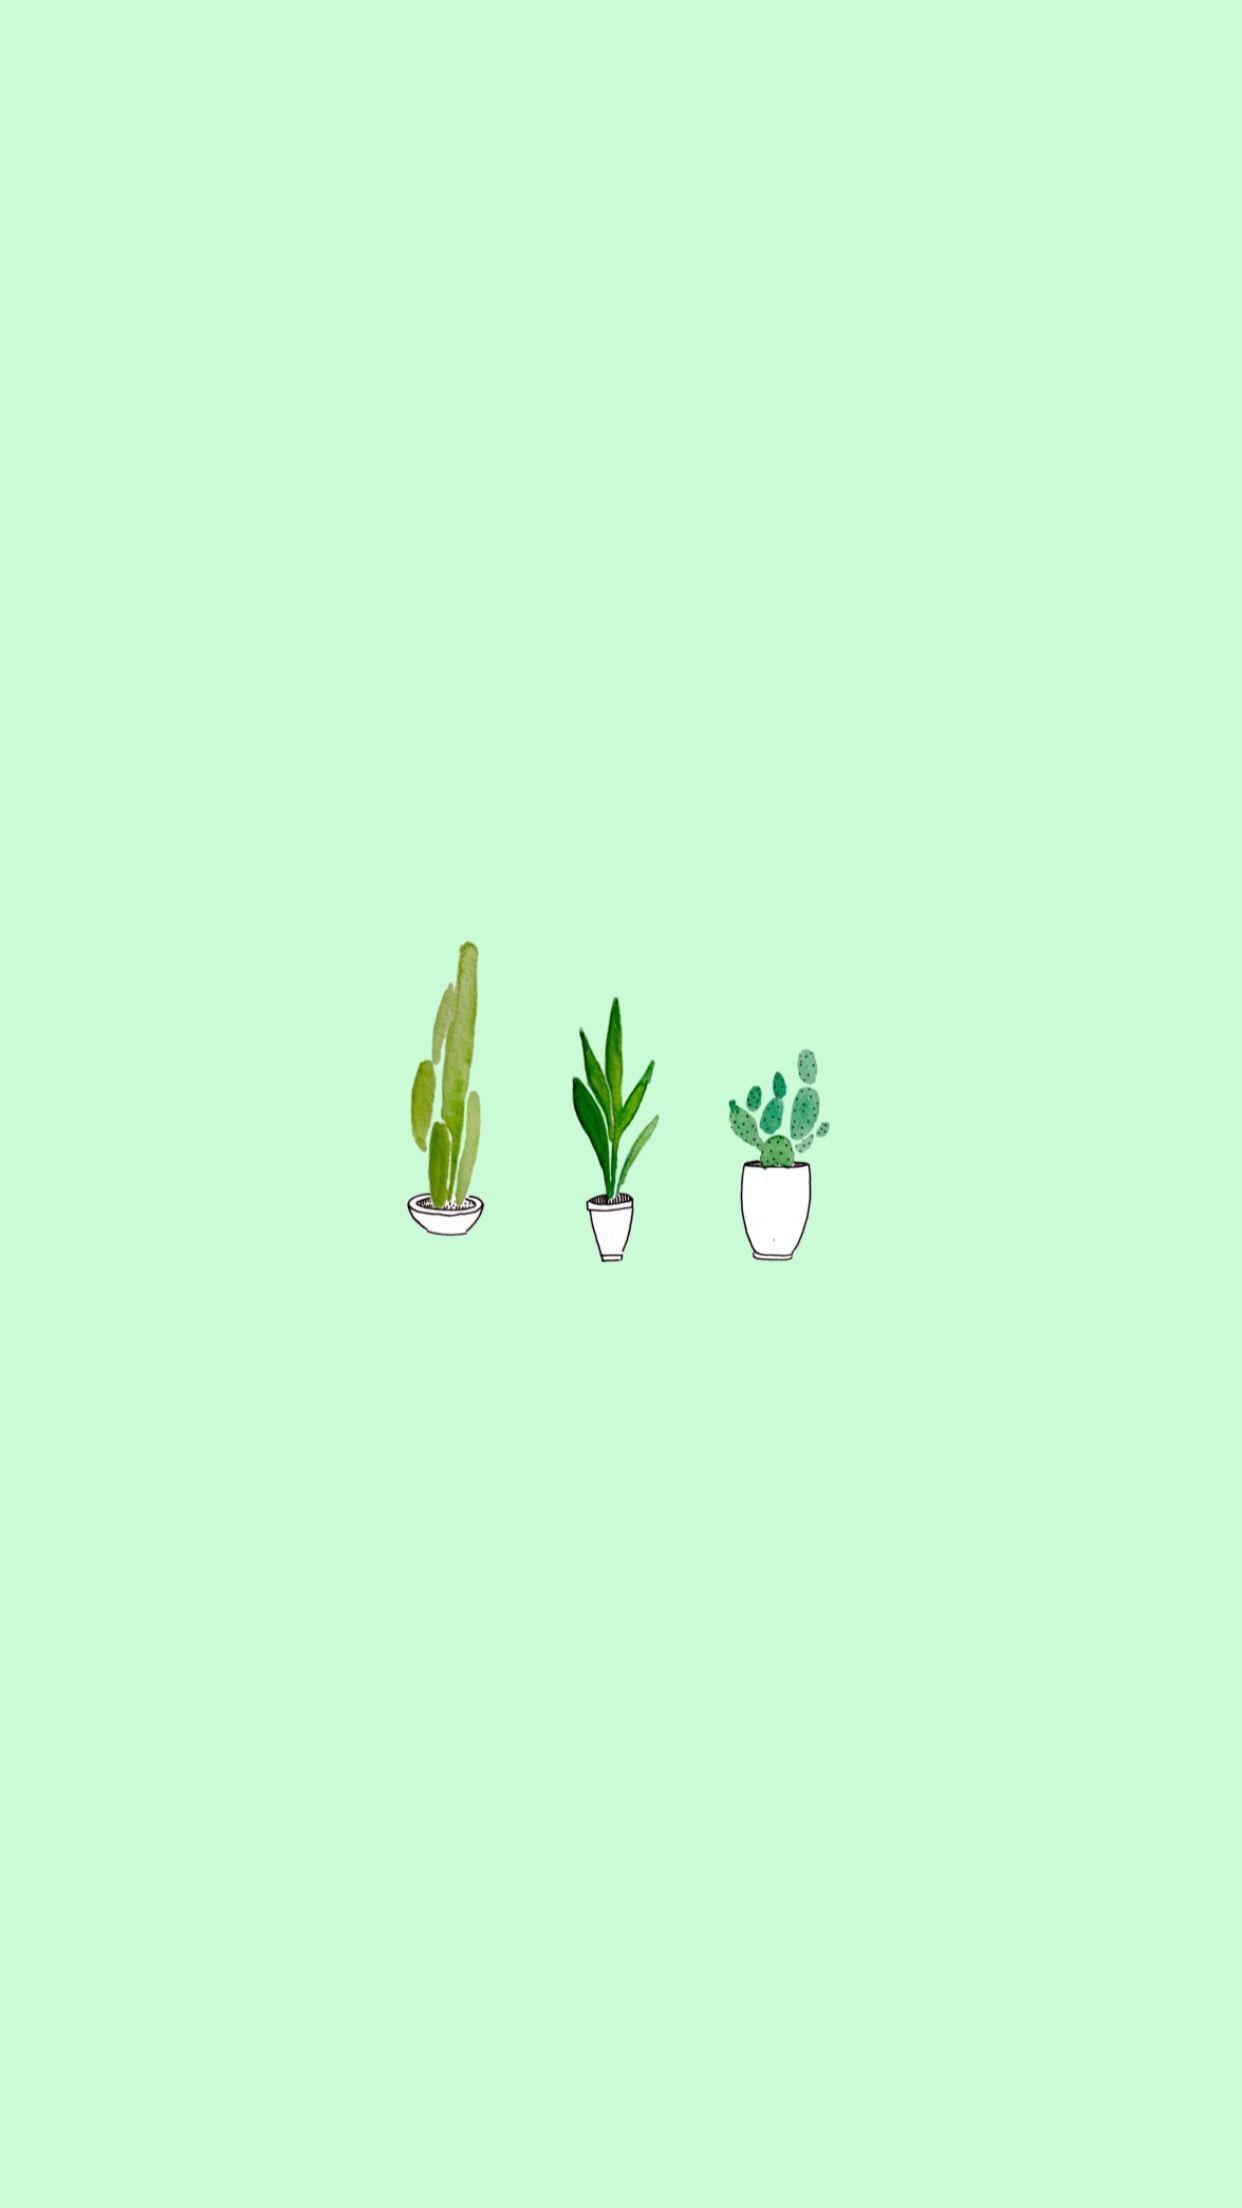 83 Green Aesthetic Wallpaper Quotes In 2020 Iphone Wallpaper Green Mint Green Wallpaper Iphone Mint Green Wallpaper